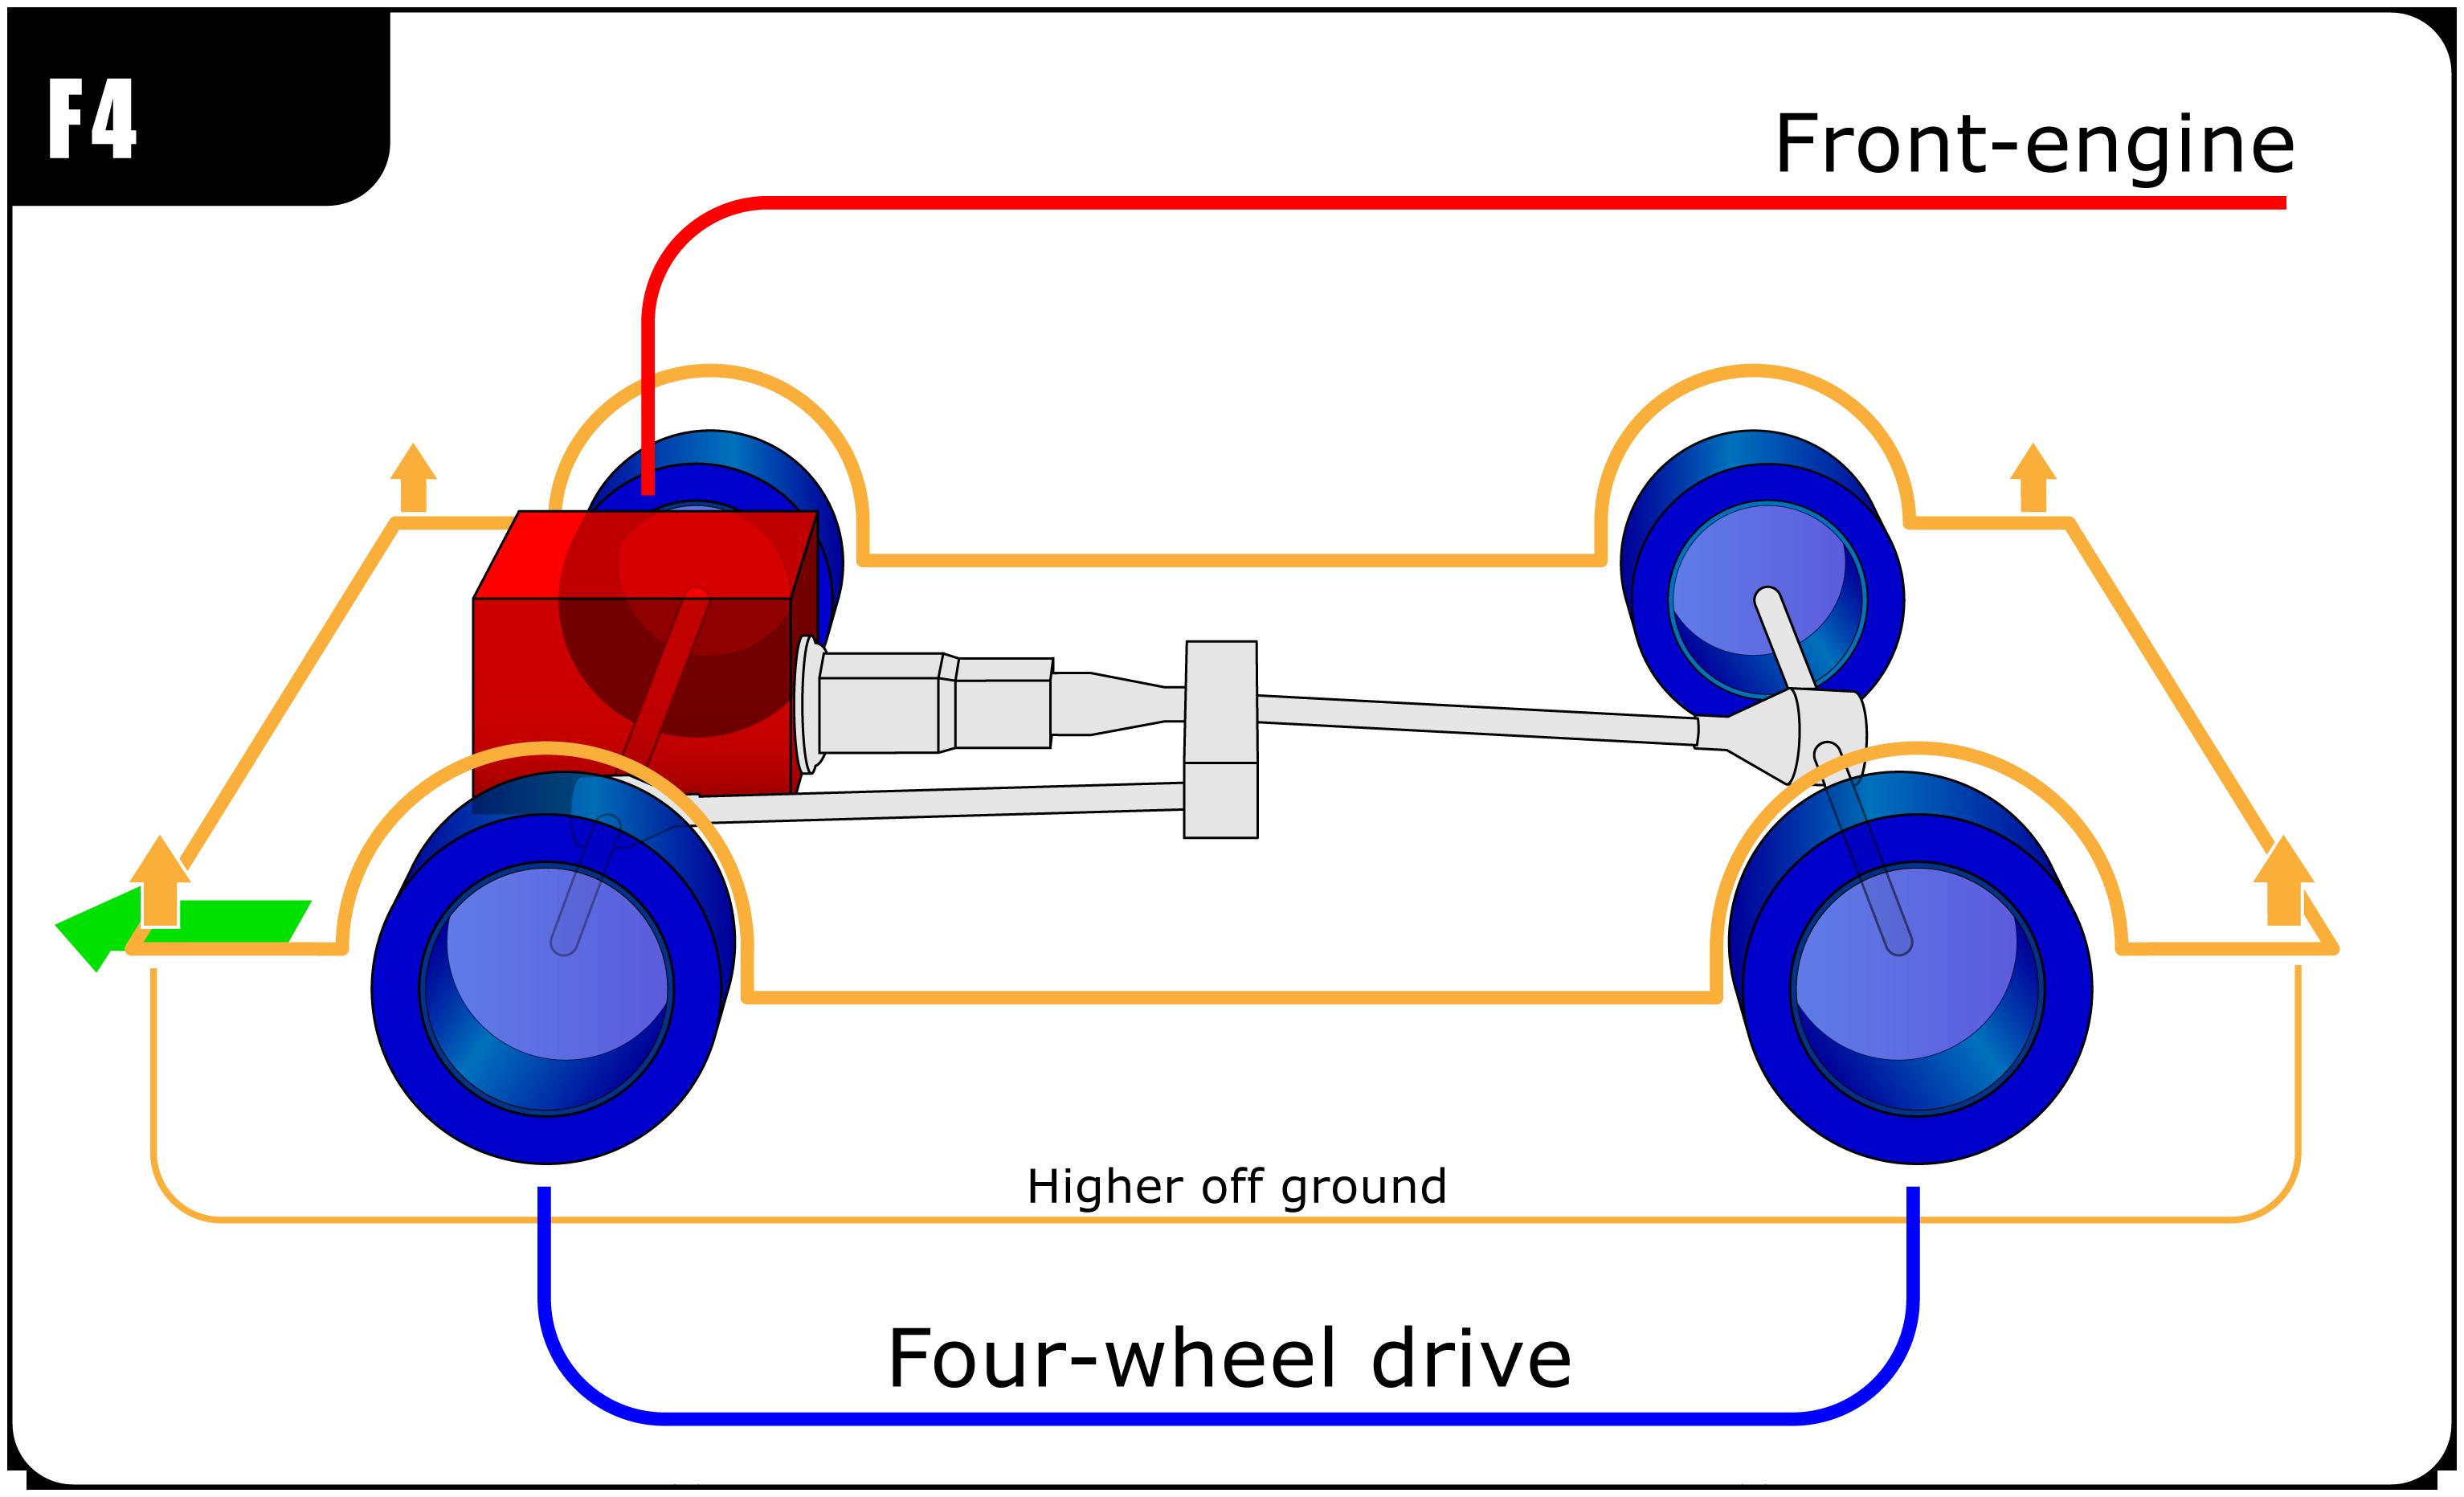 02 s10 fuel pump wiring diagram free image wiring diagram amp engine